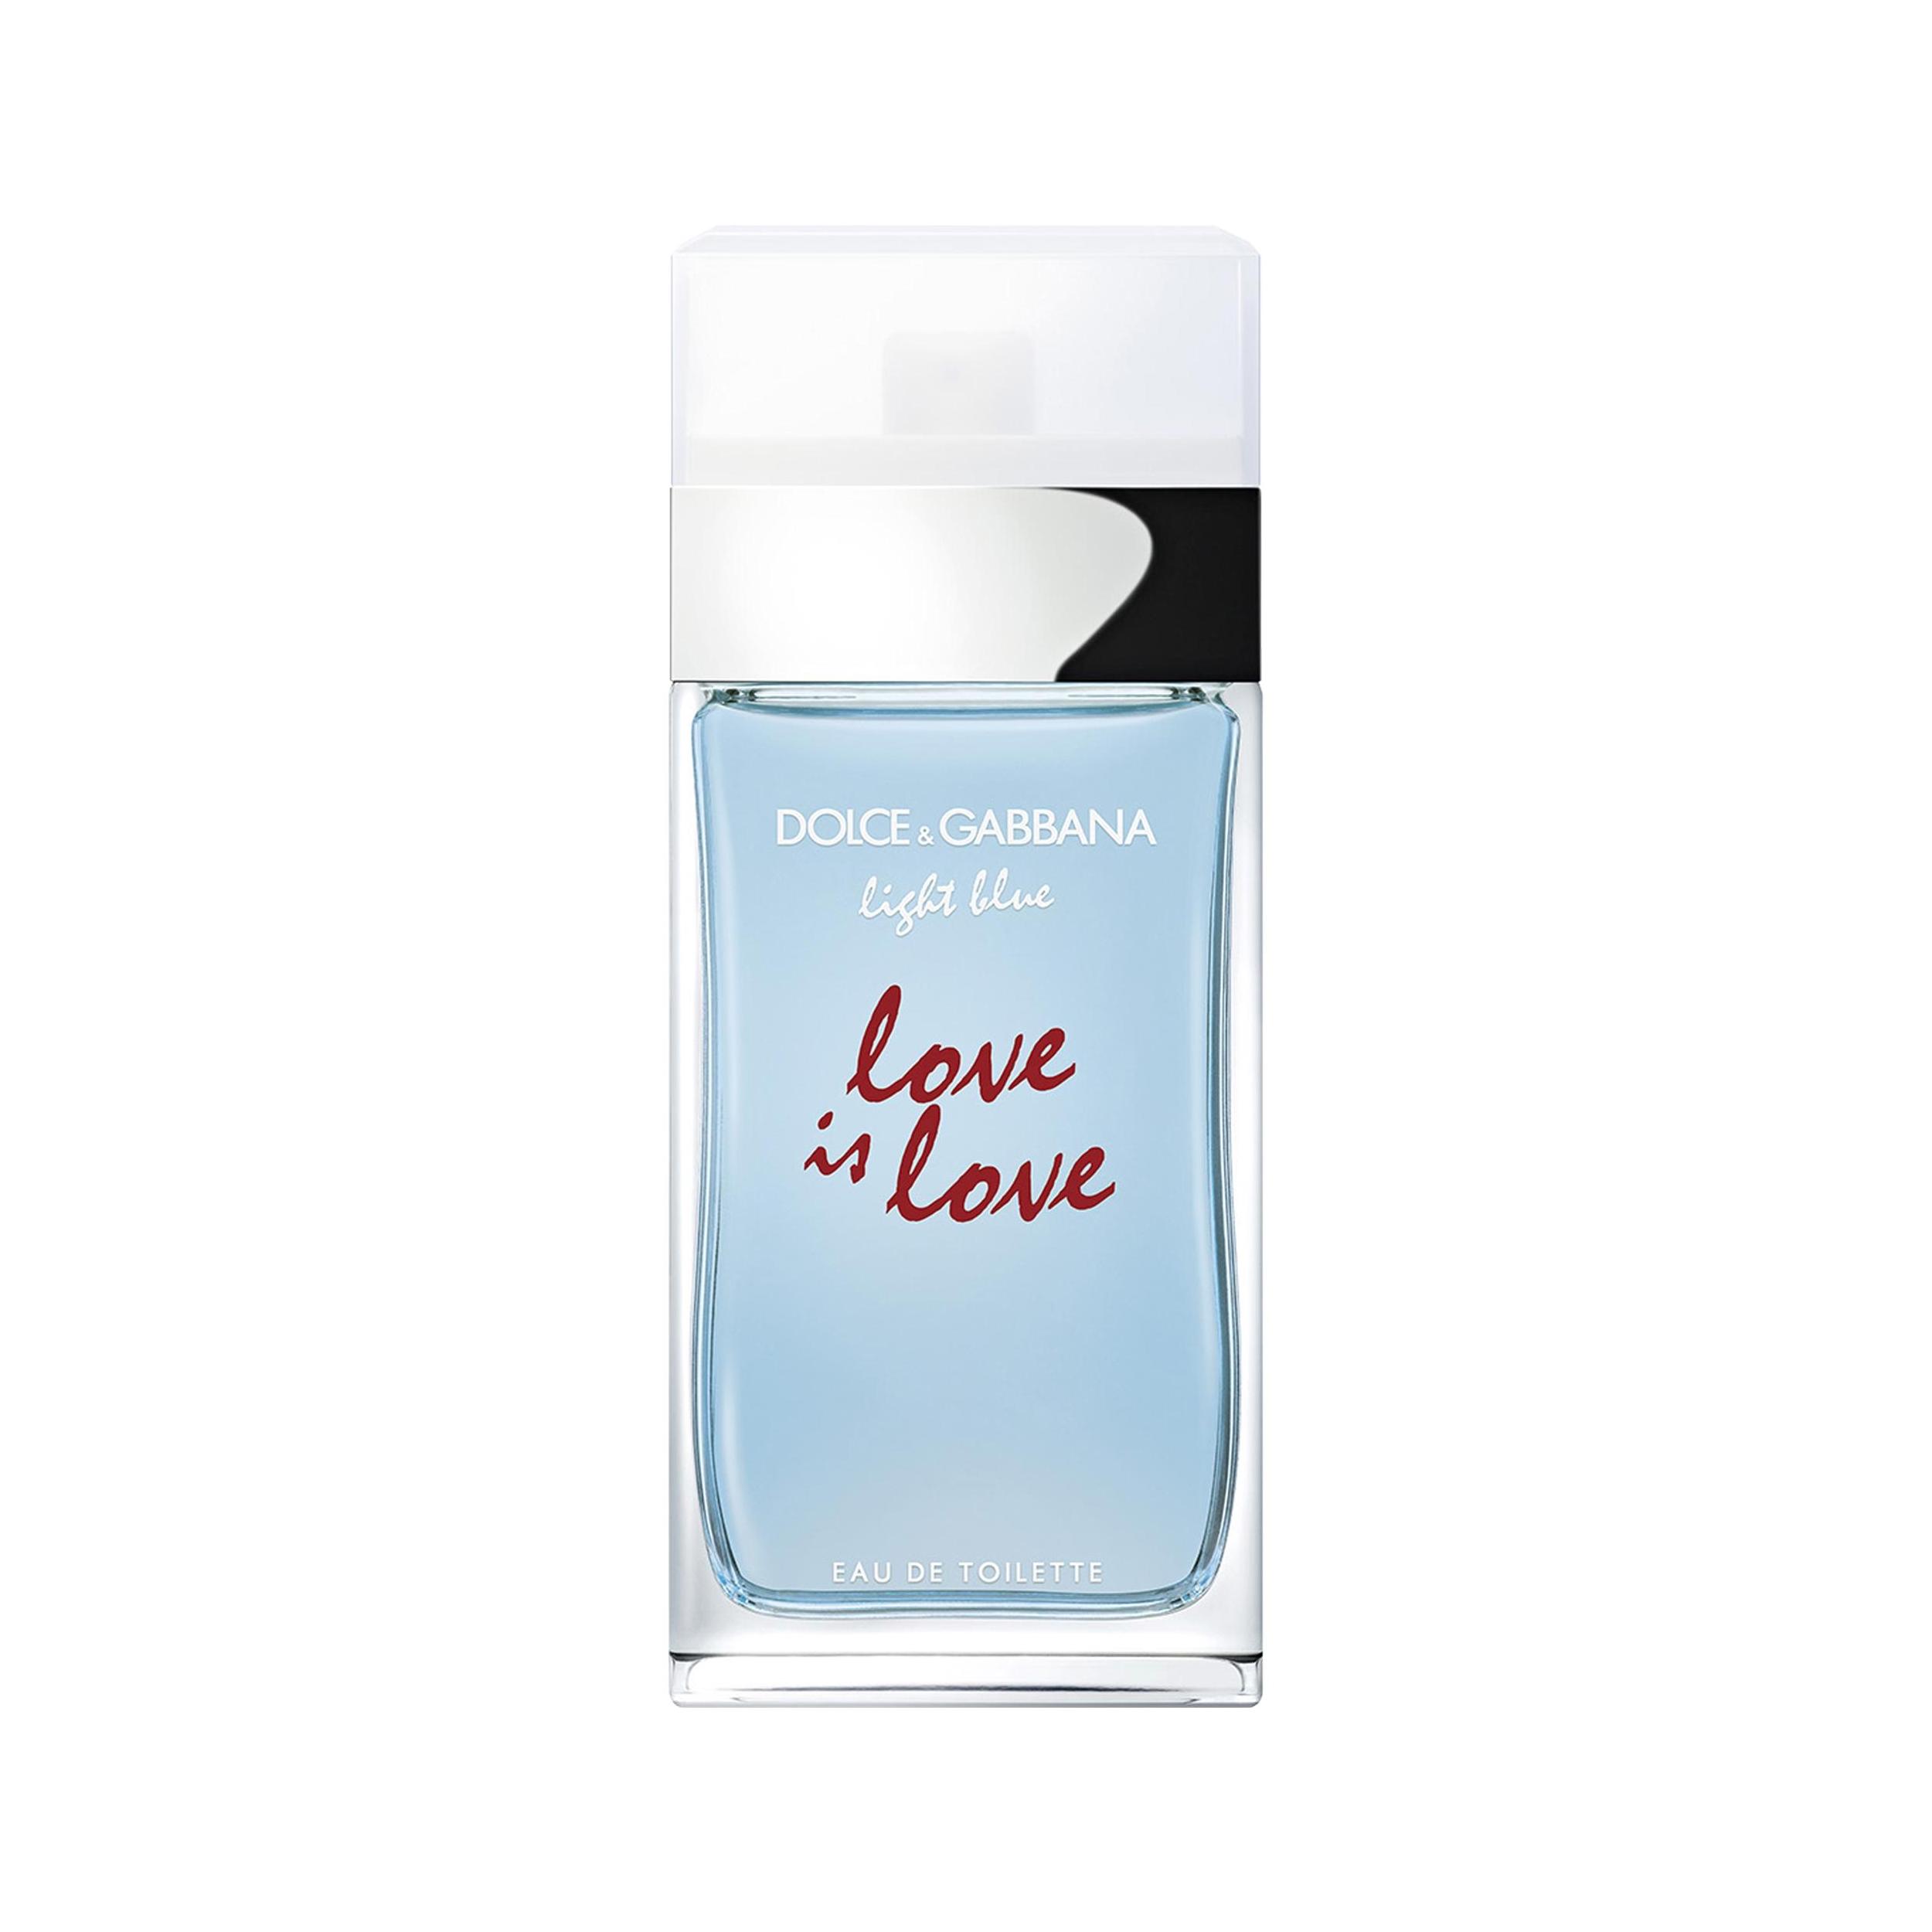 dolce-&-gabbana-light-blue-love-is-love-orchard.vn